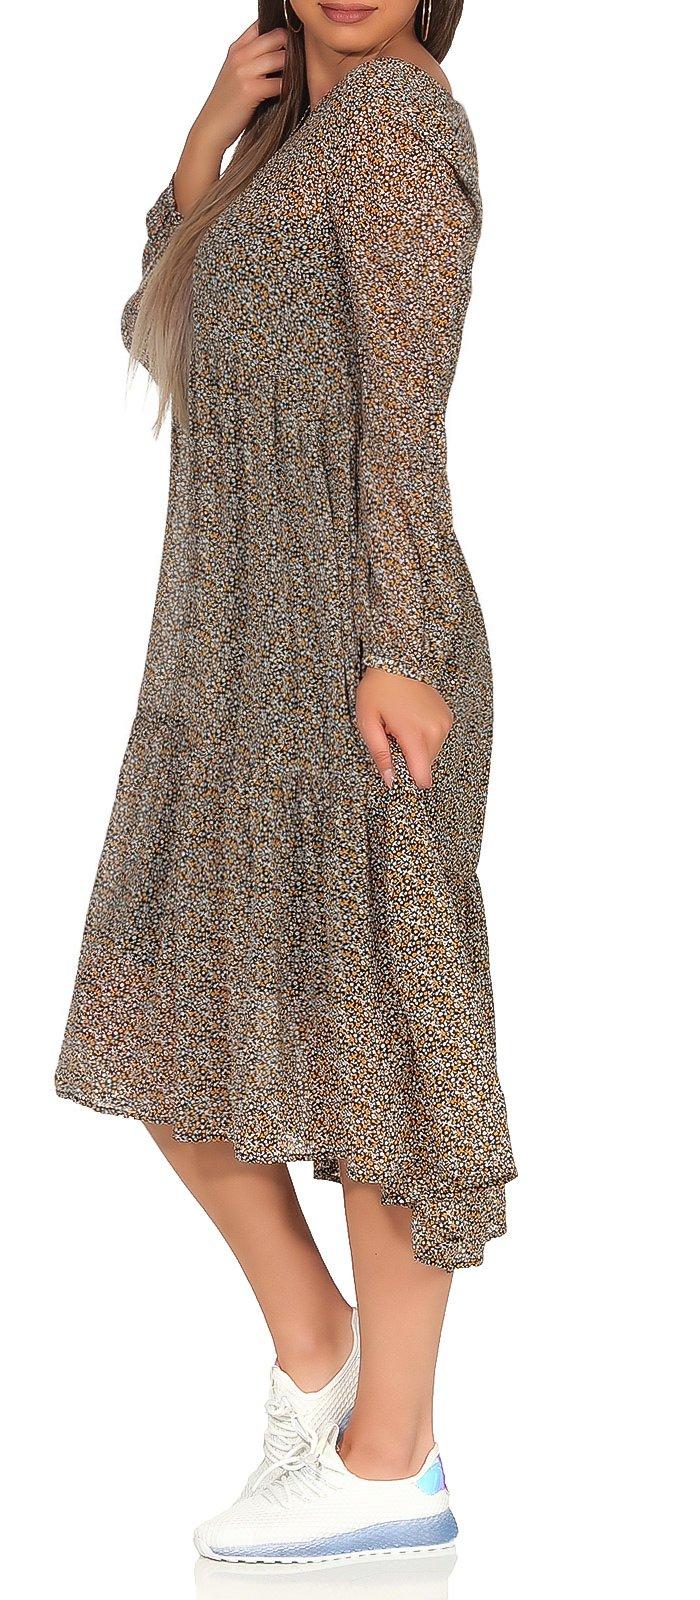 Details zu Vero Moda Damen Kleid Sommerkleid Strandkleid Bohokleid geblümt  langarm Naira